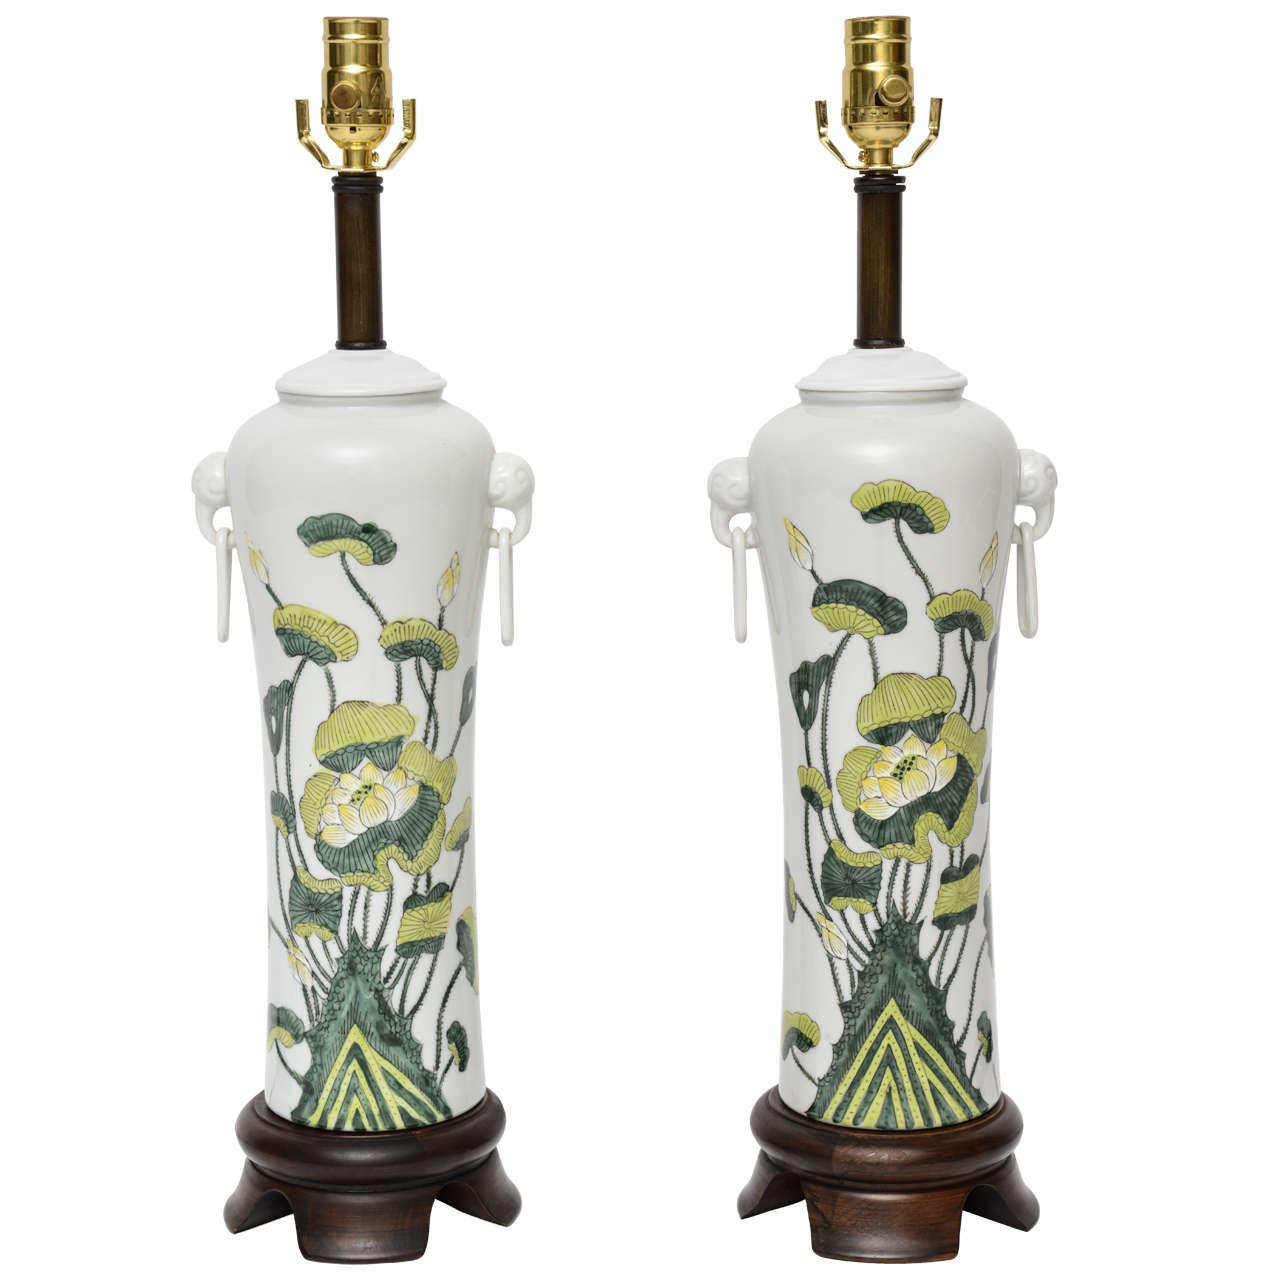 1960s japanese porcelain lotus flower vase form table lamps for sale 1960s japanese porcelain lotus flower vase form table lamps for sale izmirmasajfo